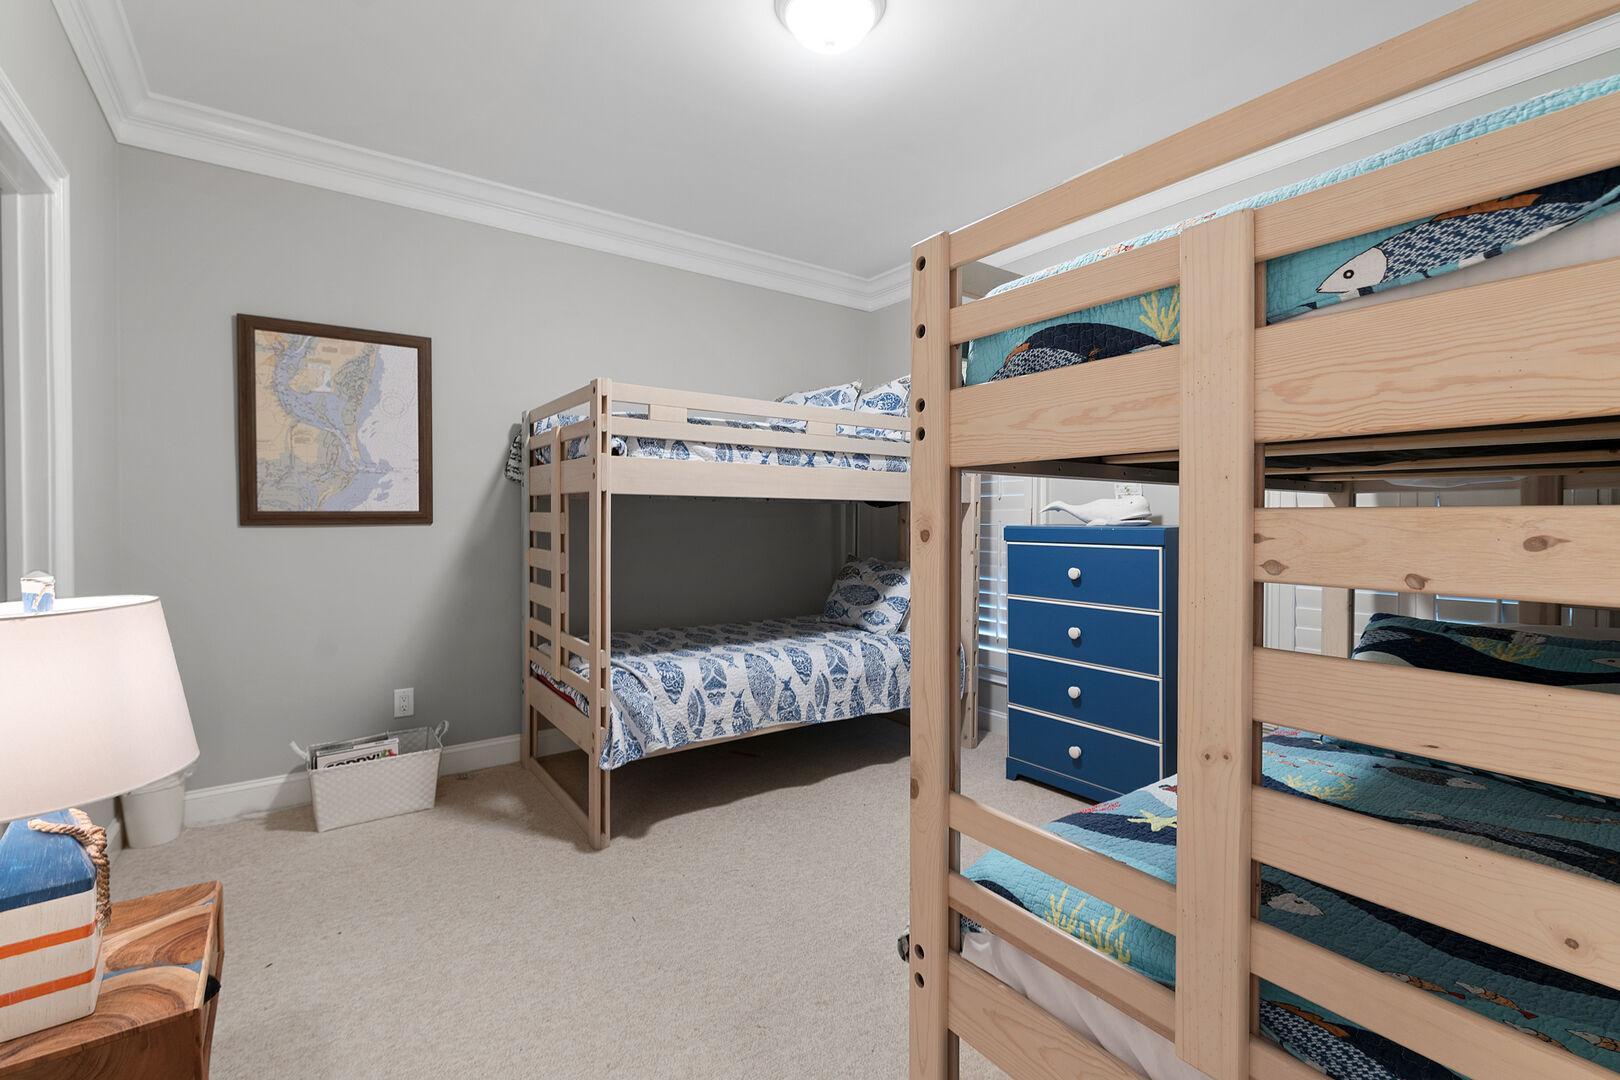 2 Sets of Bunk Beds - Second Floor